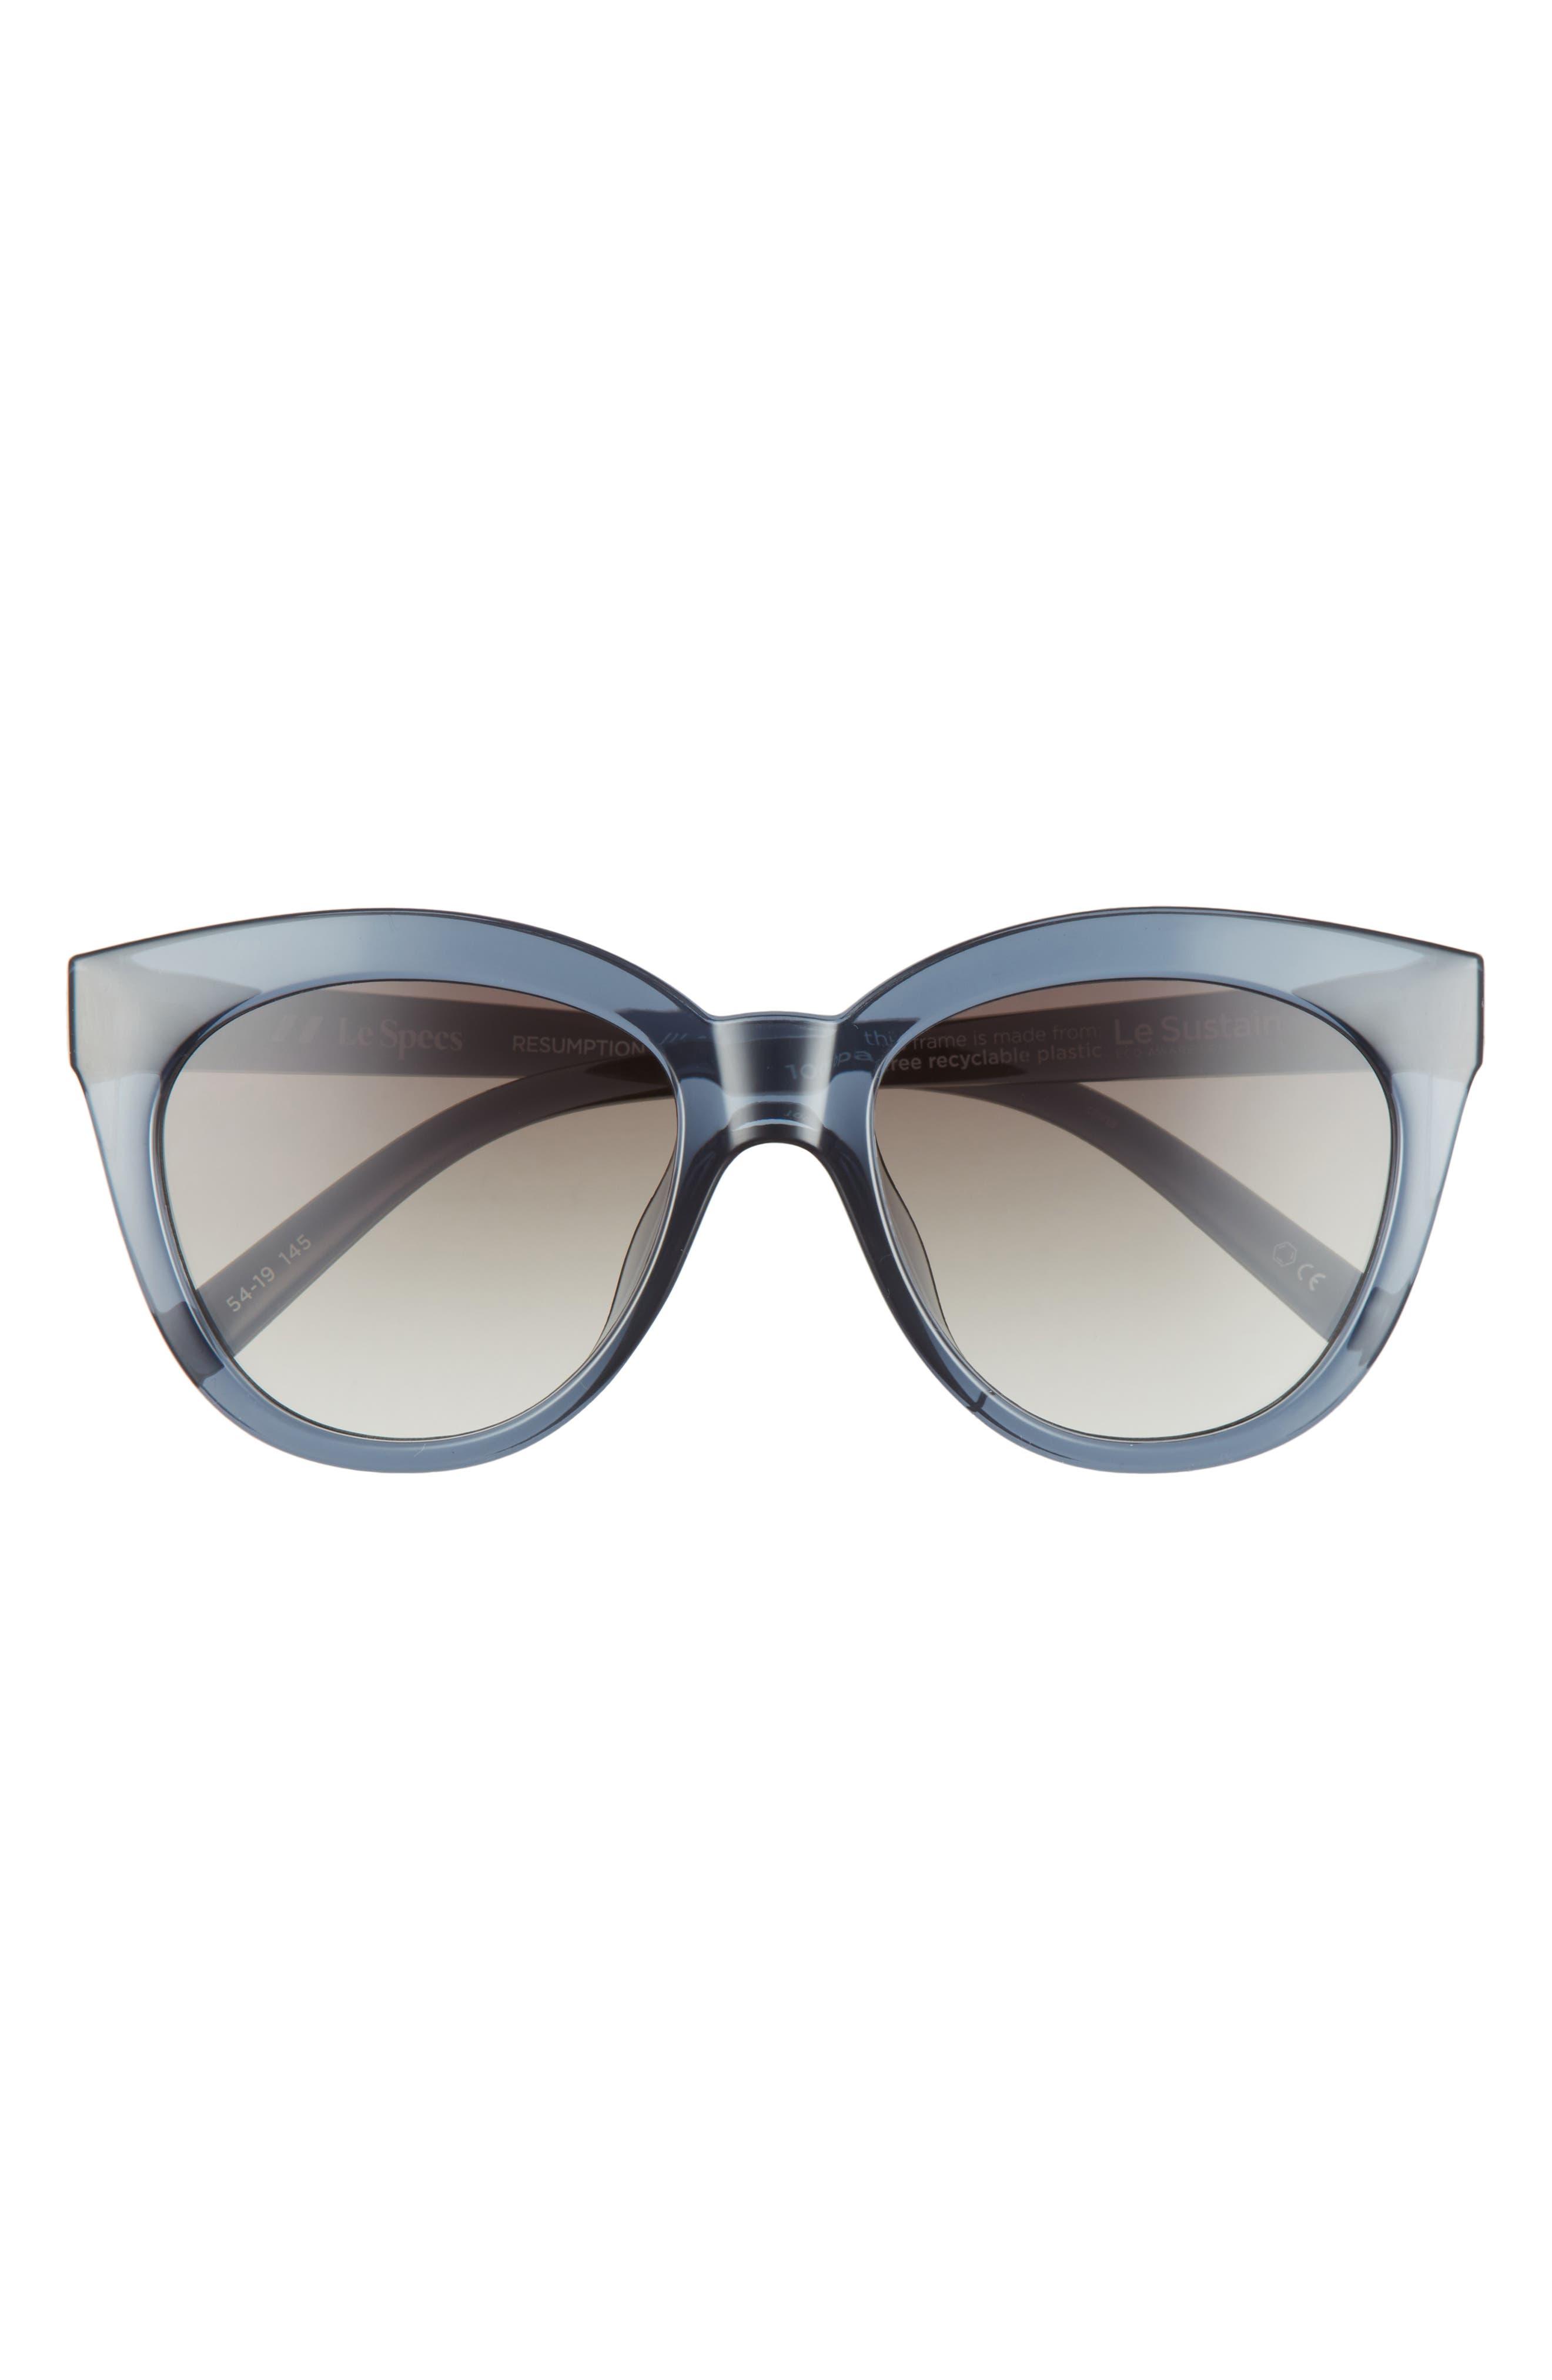 Resumption 54mm Round Cat Eye Sunglasses